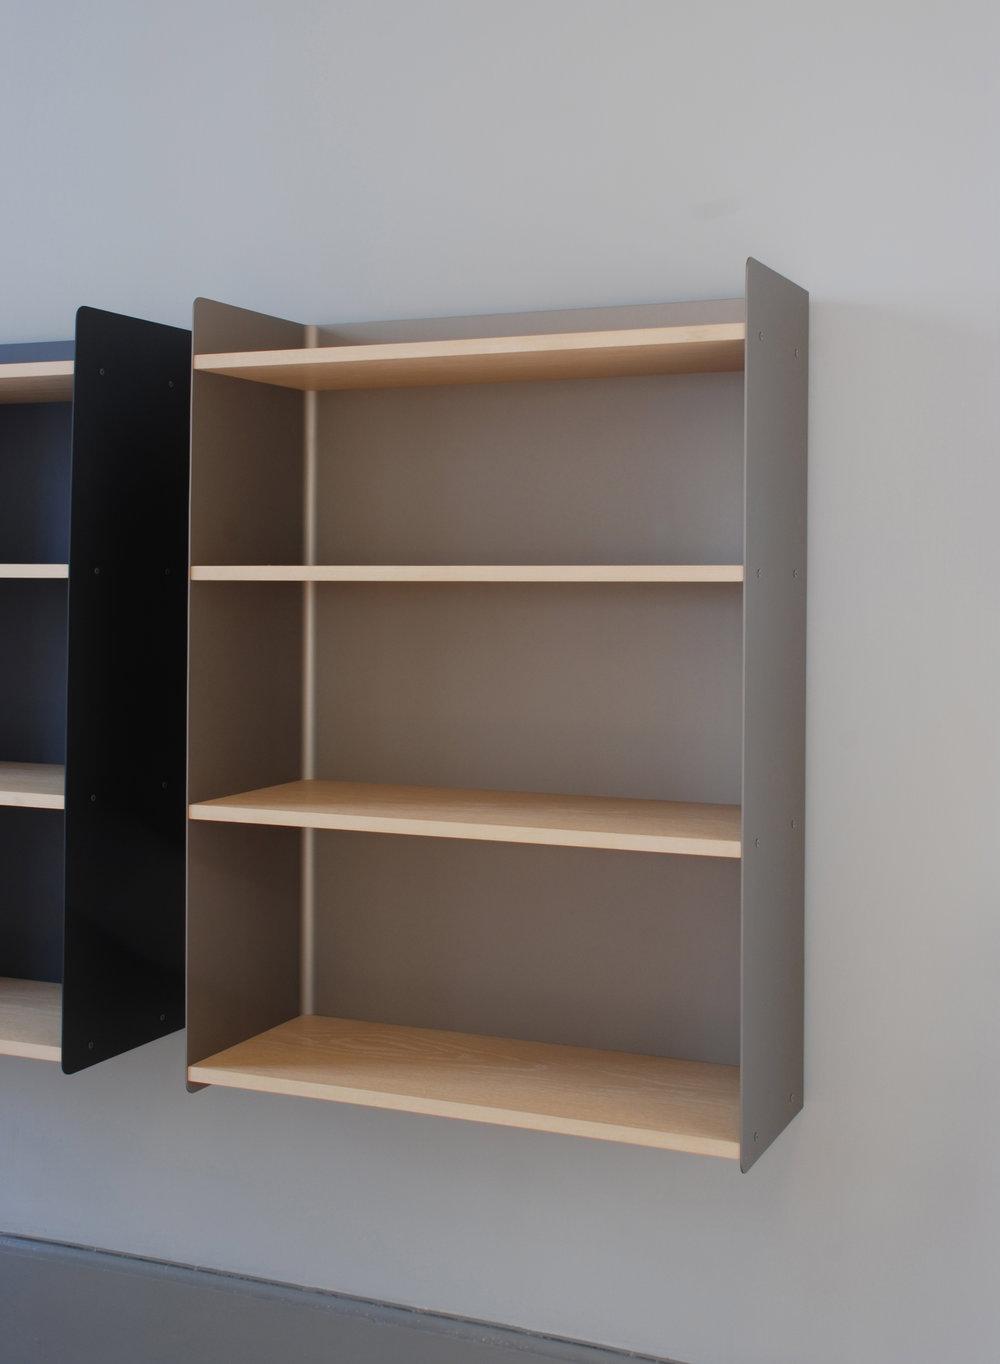 120305_depping_shelf.jpeg